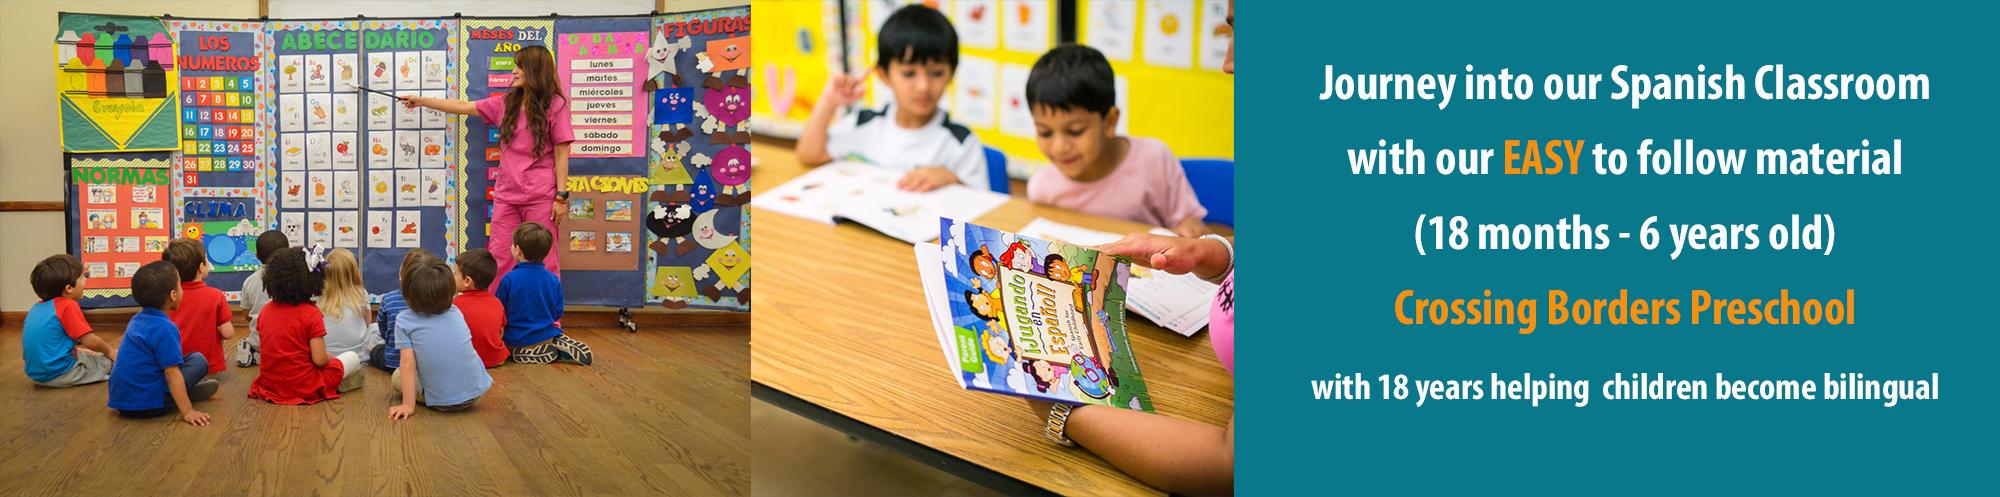 crossing borders preschool preschool houston early childhood education tx daycare 397